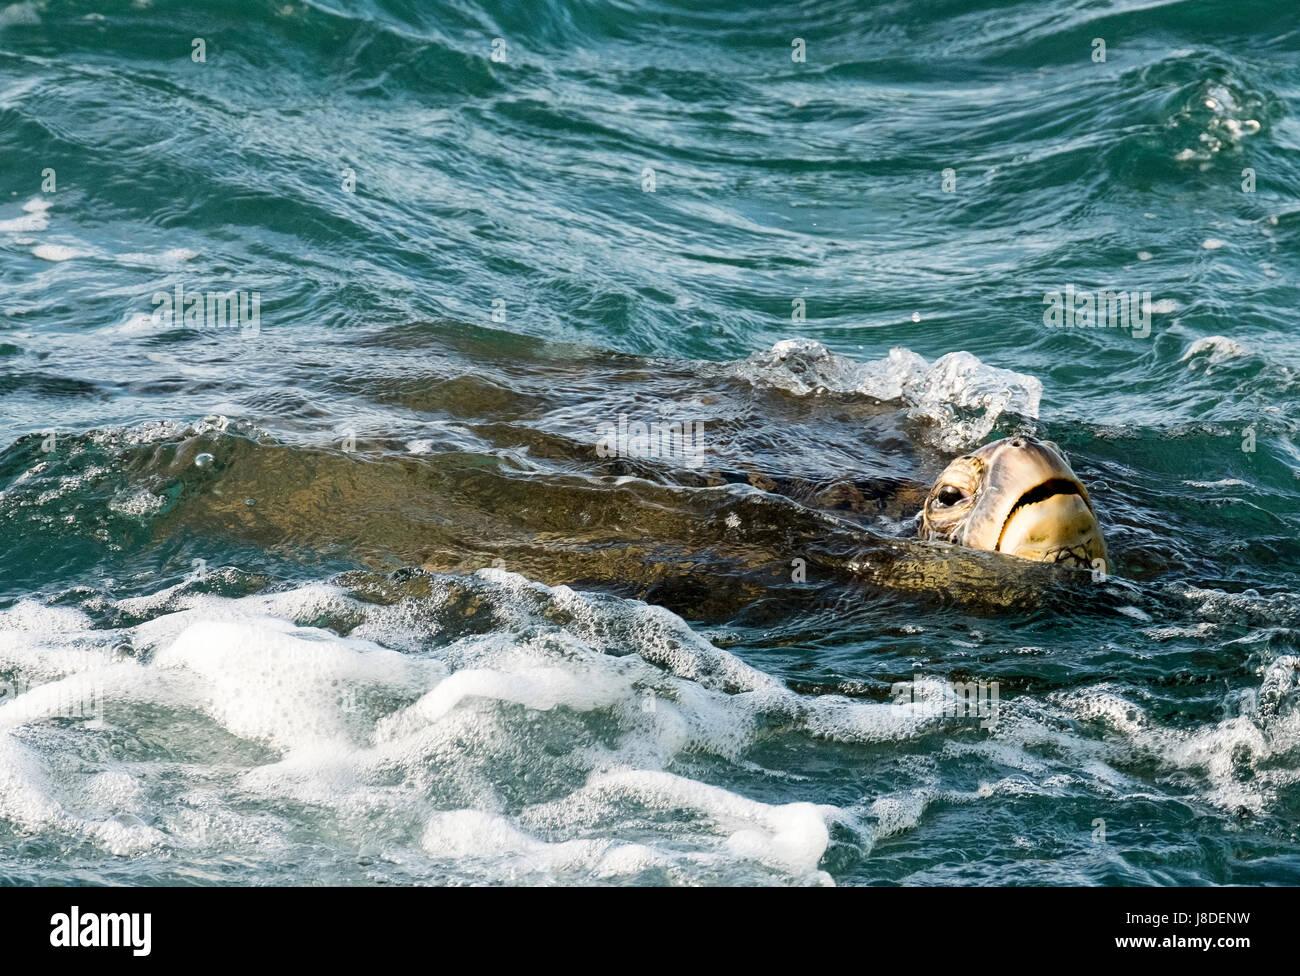 A Green Sea Turtle swimming of the coast of Maui, Hawaii - Stock Image